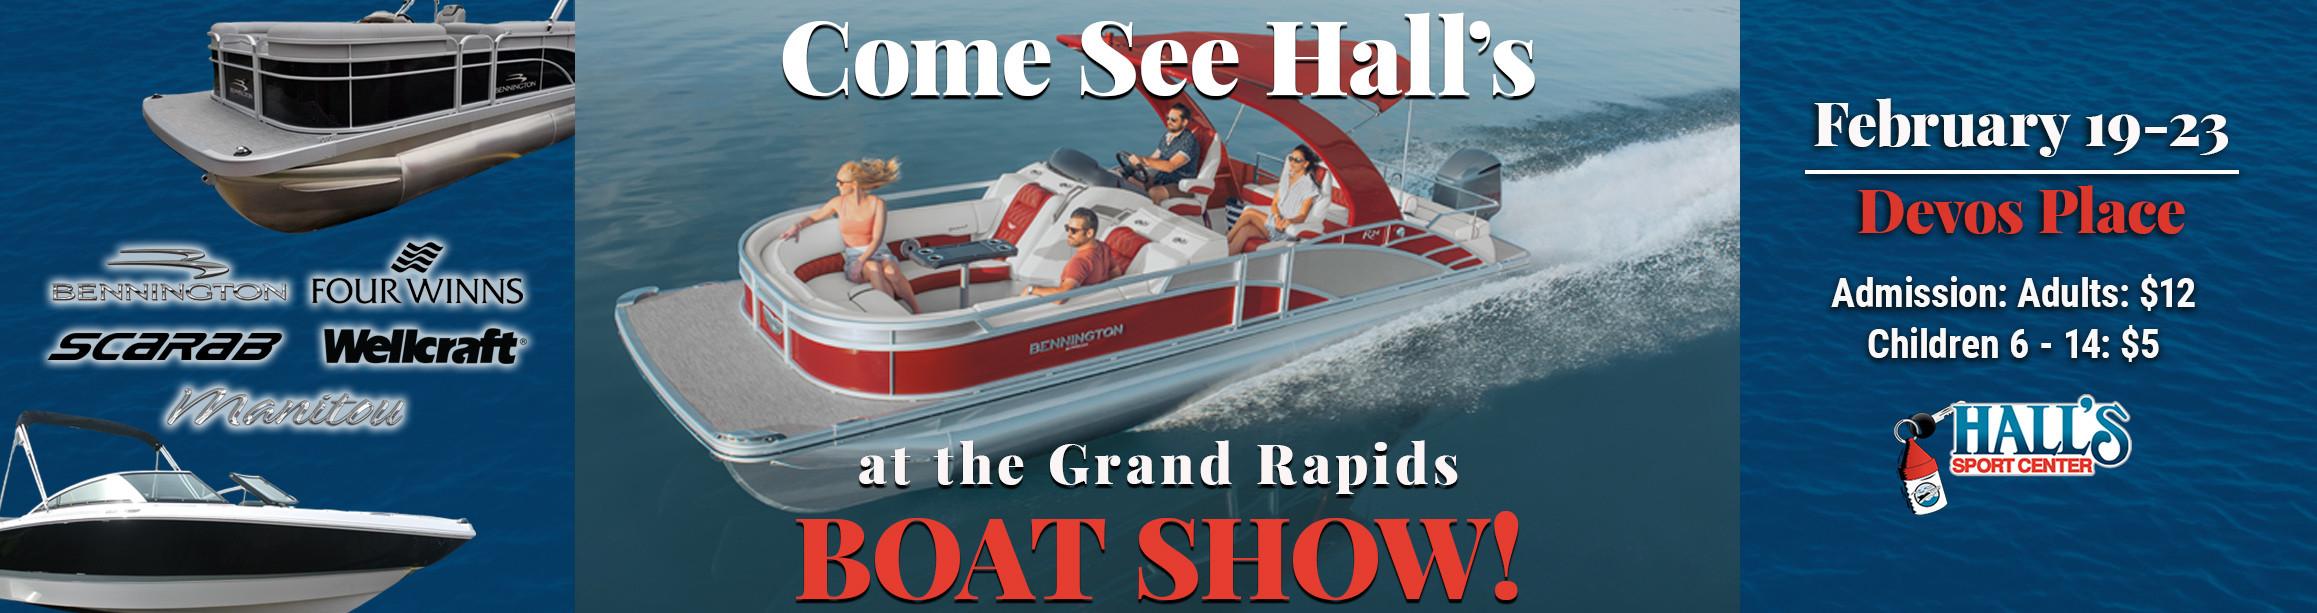 gr-boat-show-copy-001